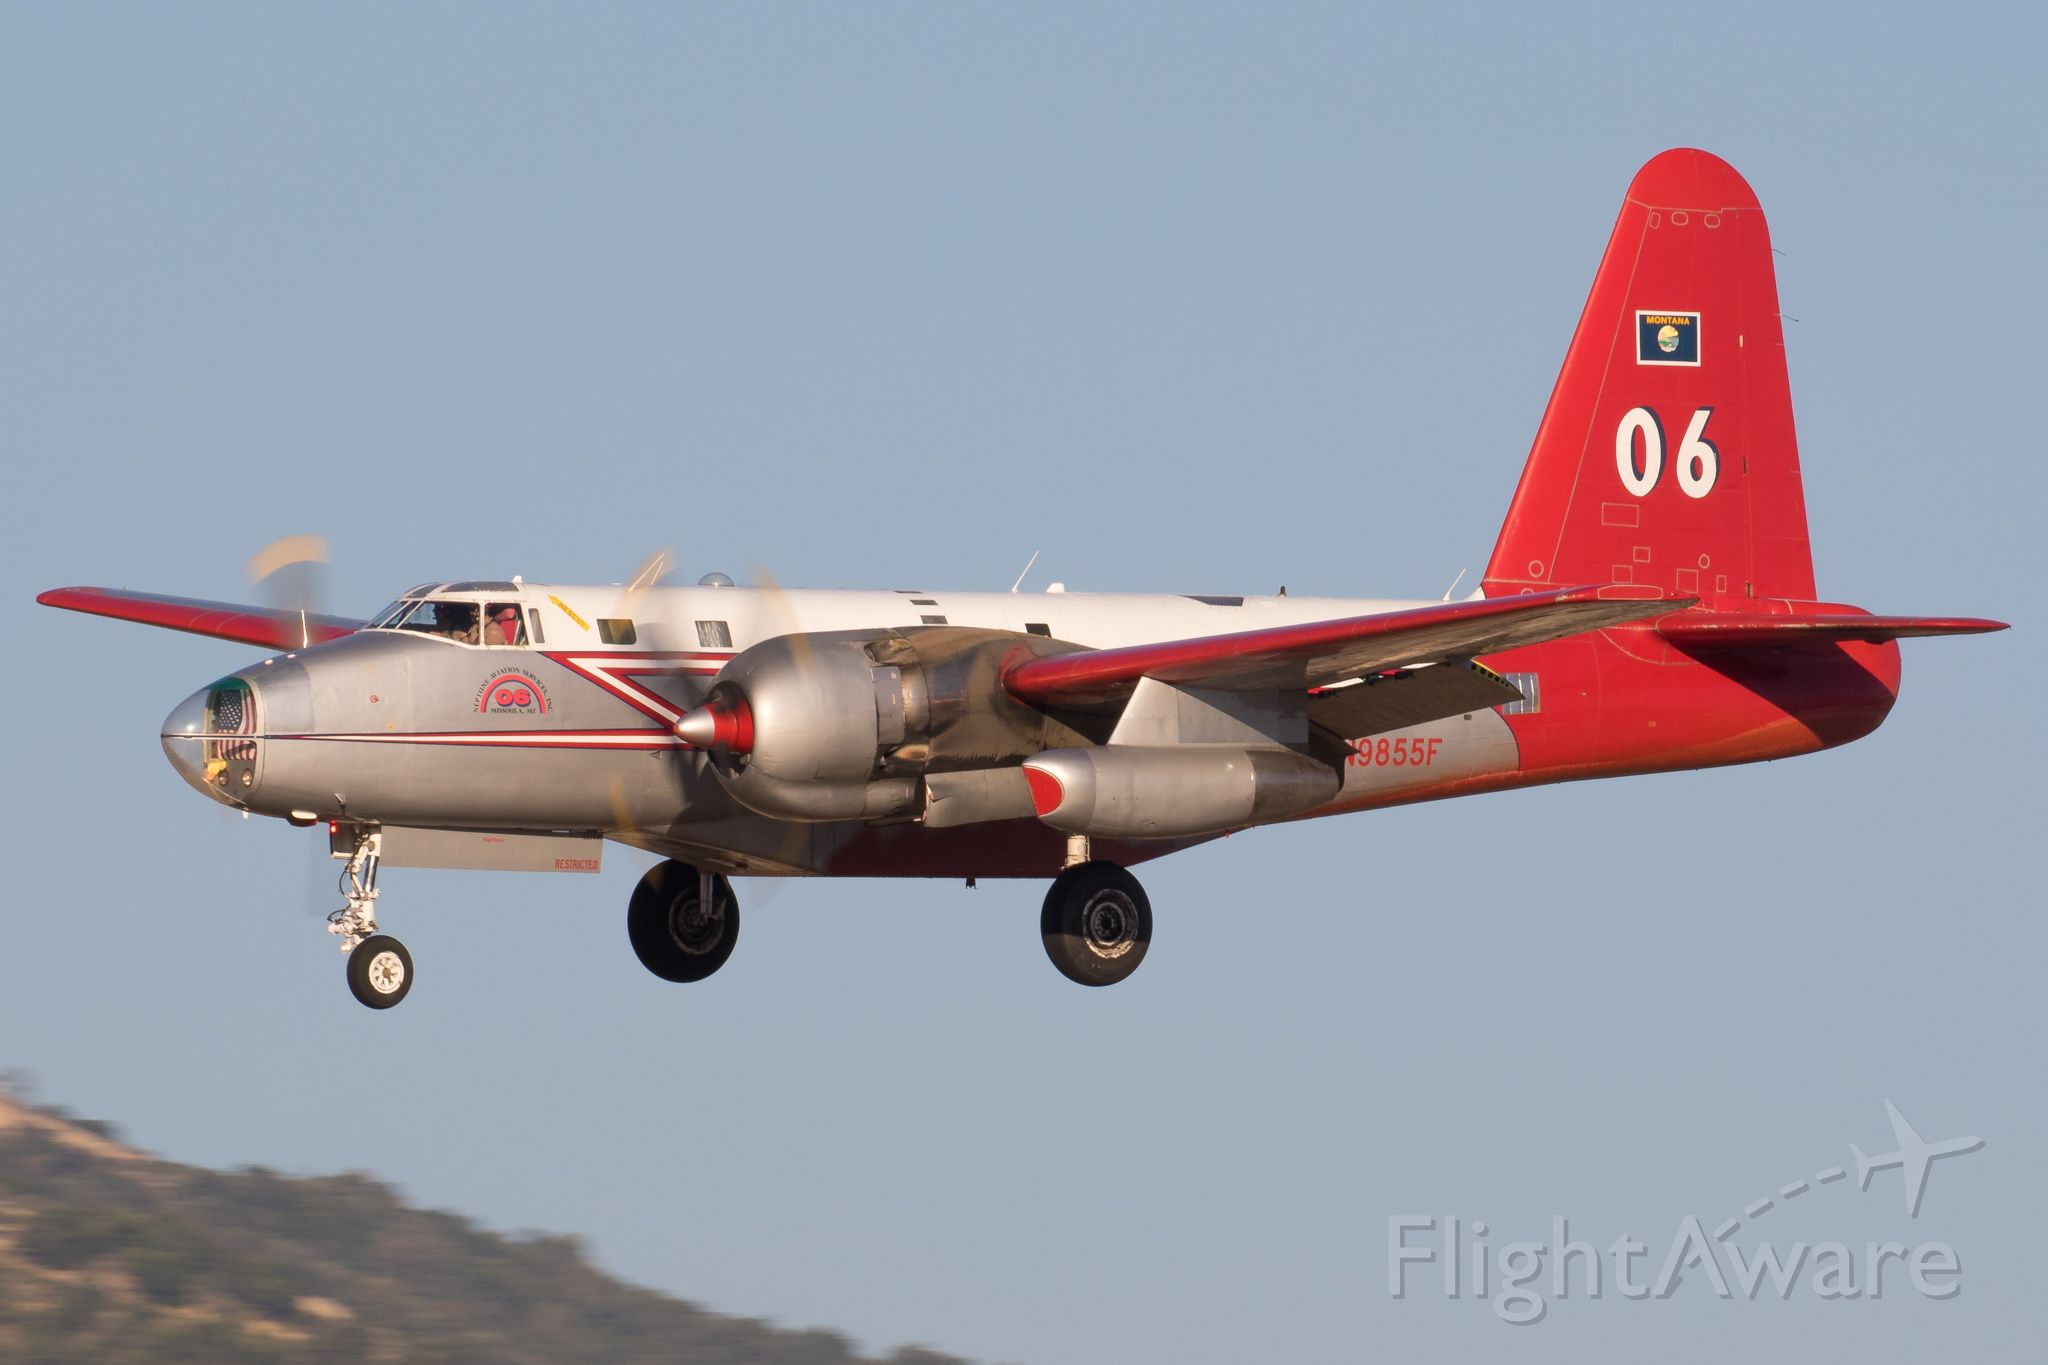 Lockheed P-2 Neptune (N9855F)